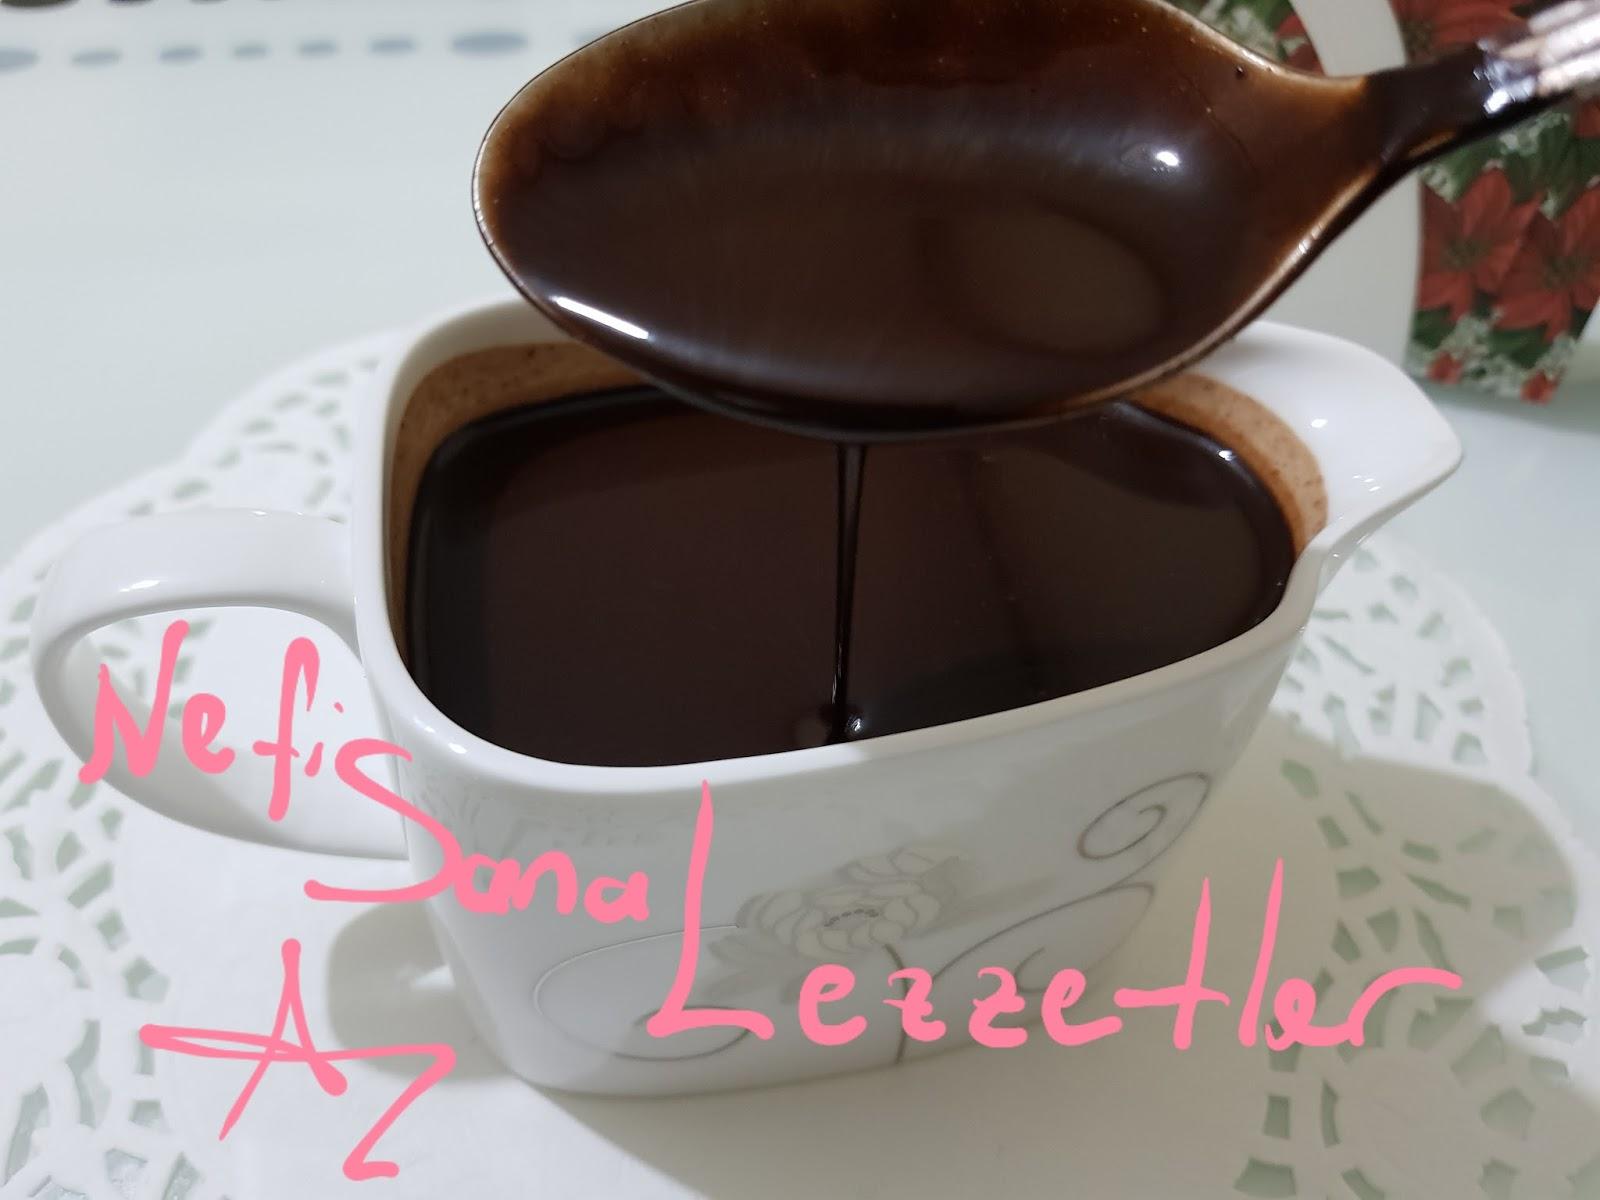 Ev Yapımı Çikolata Sos